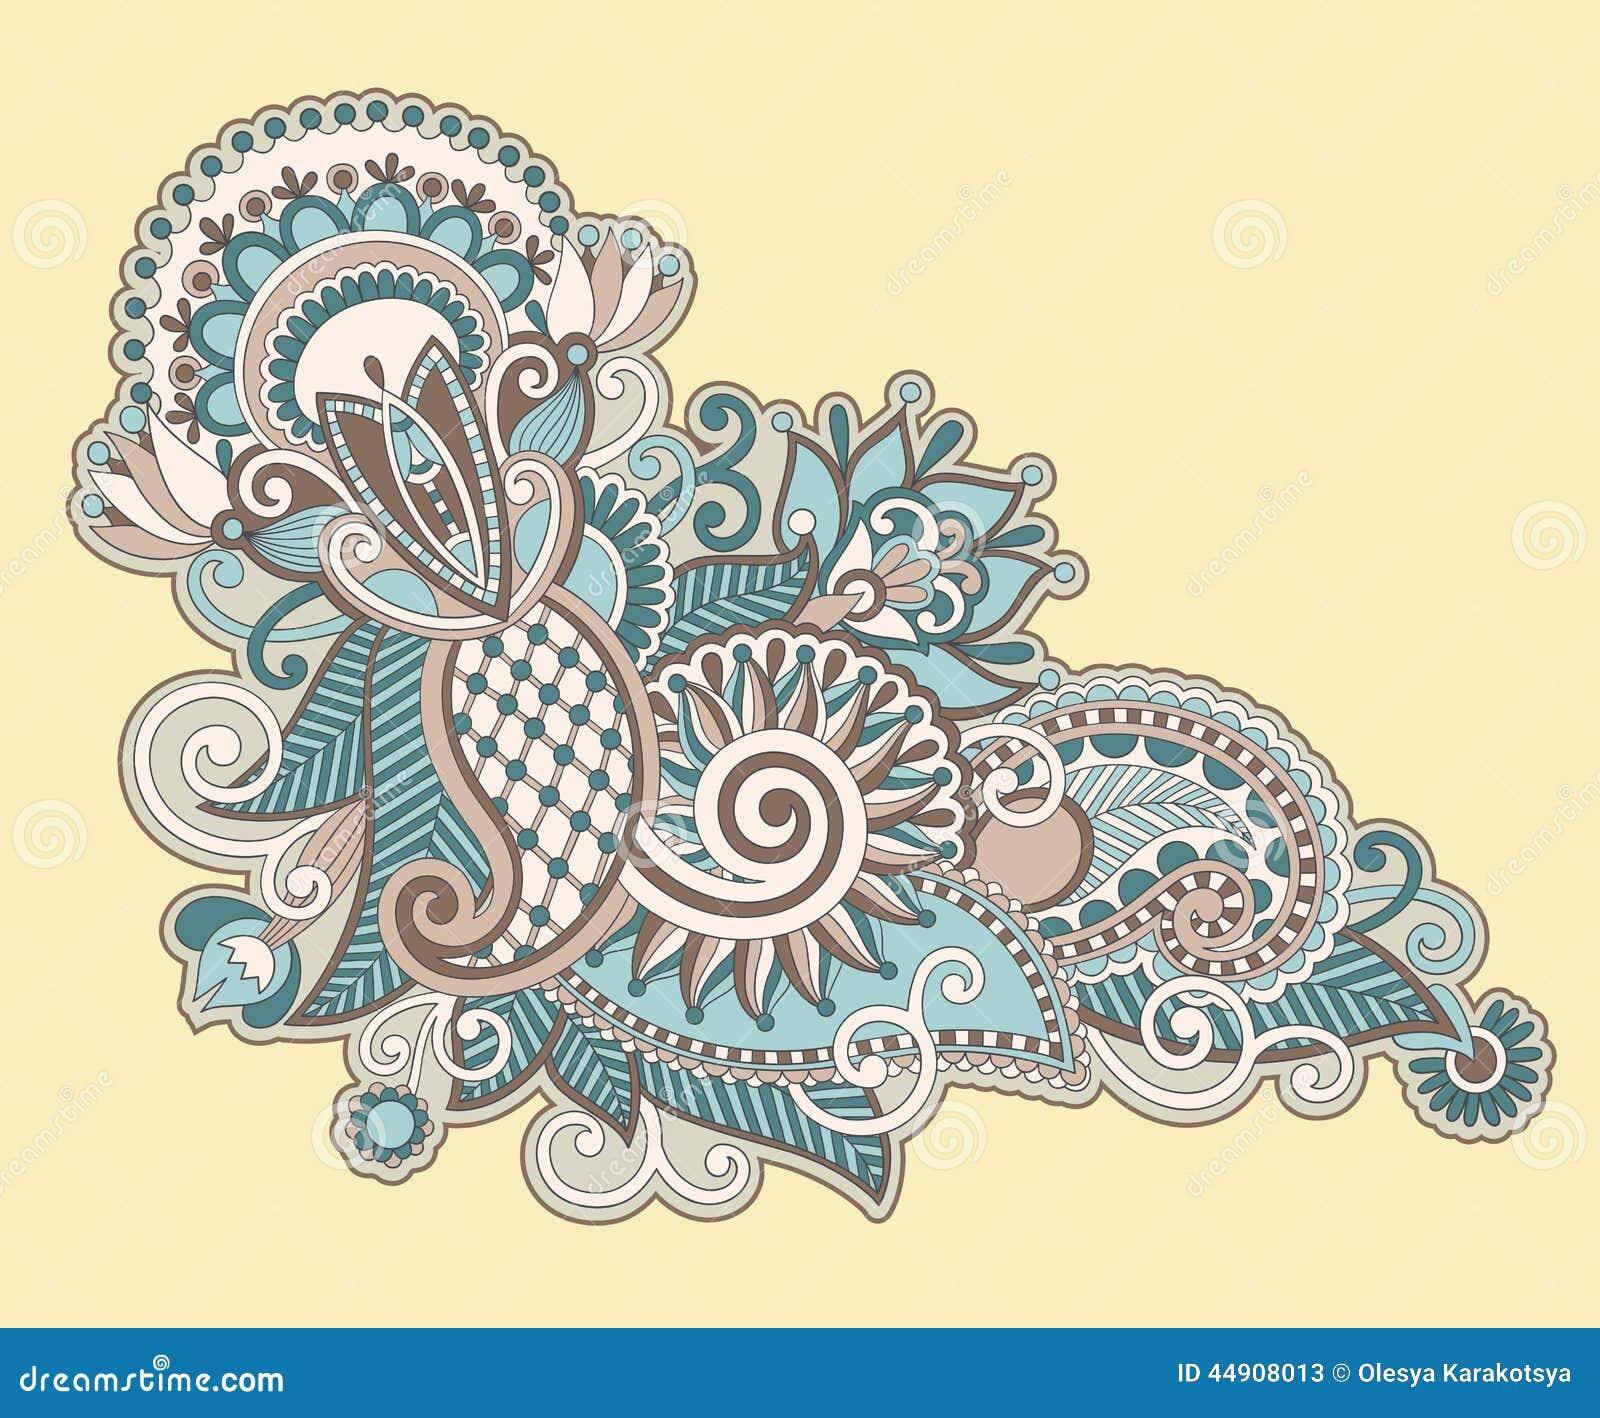 Line Art Ornate Flower Design : Hand draw line art ornate flower design stock vector